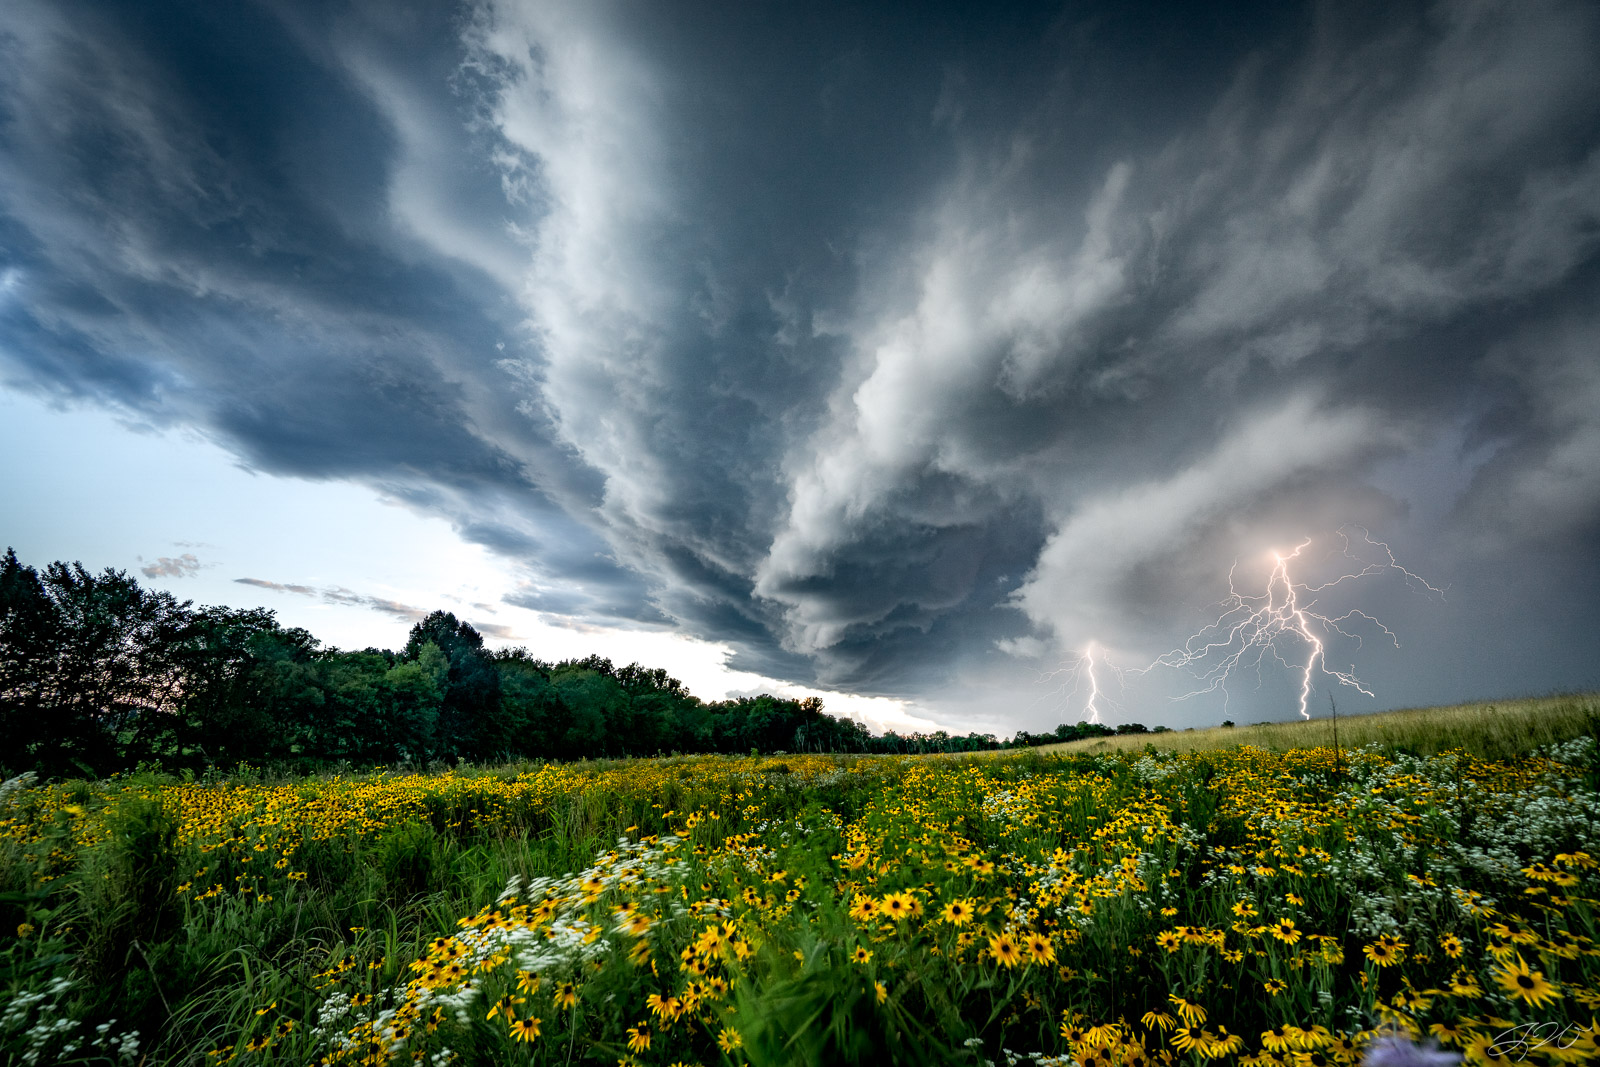 lightning, strike, shelf cloud, tornado, flower, wildflowers, storm, black eyed susan, photo